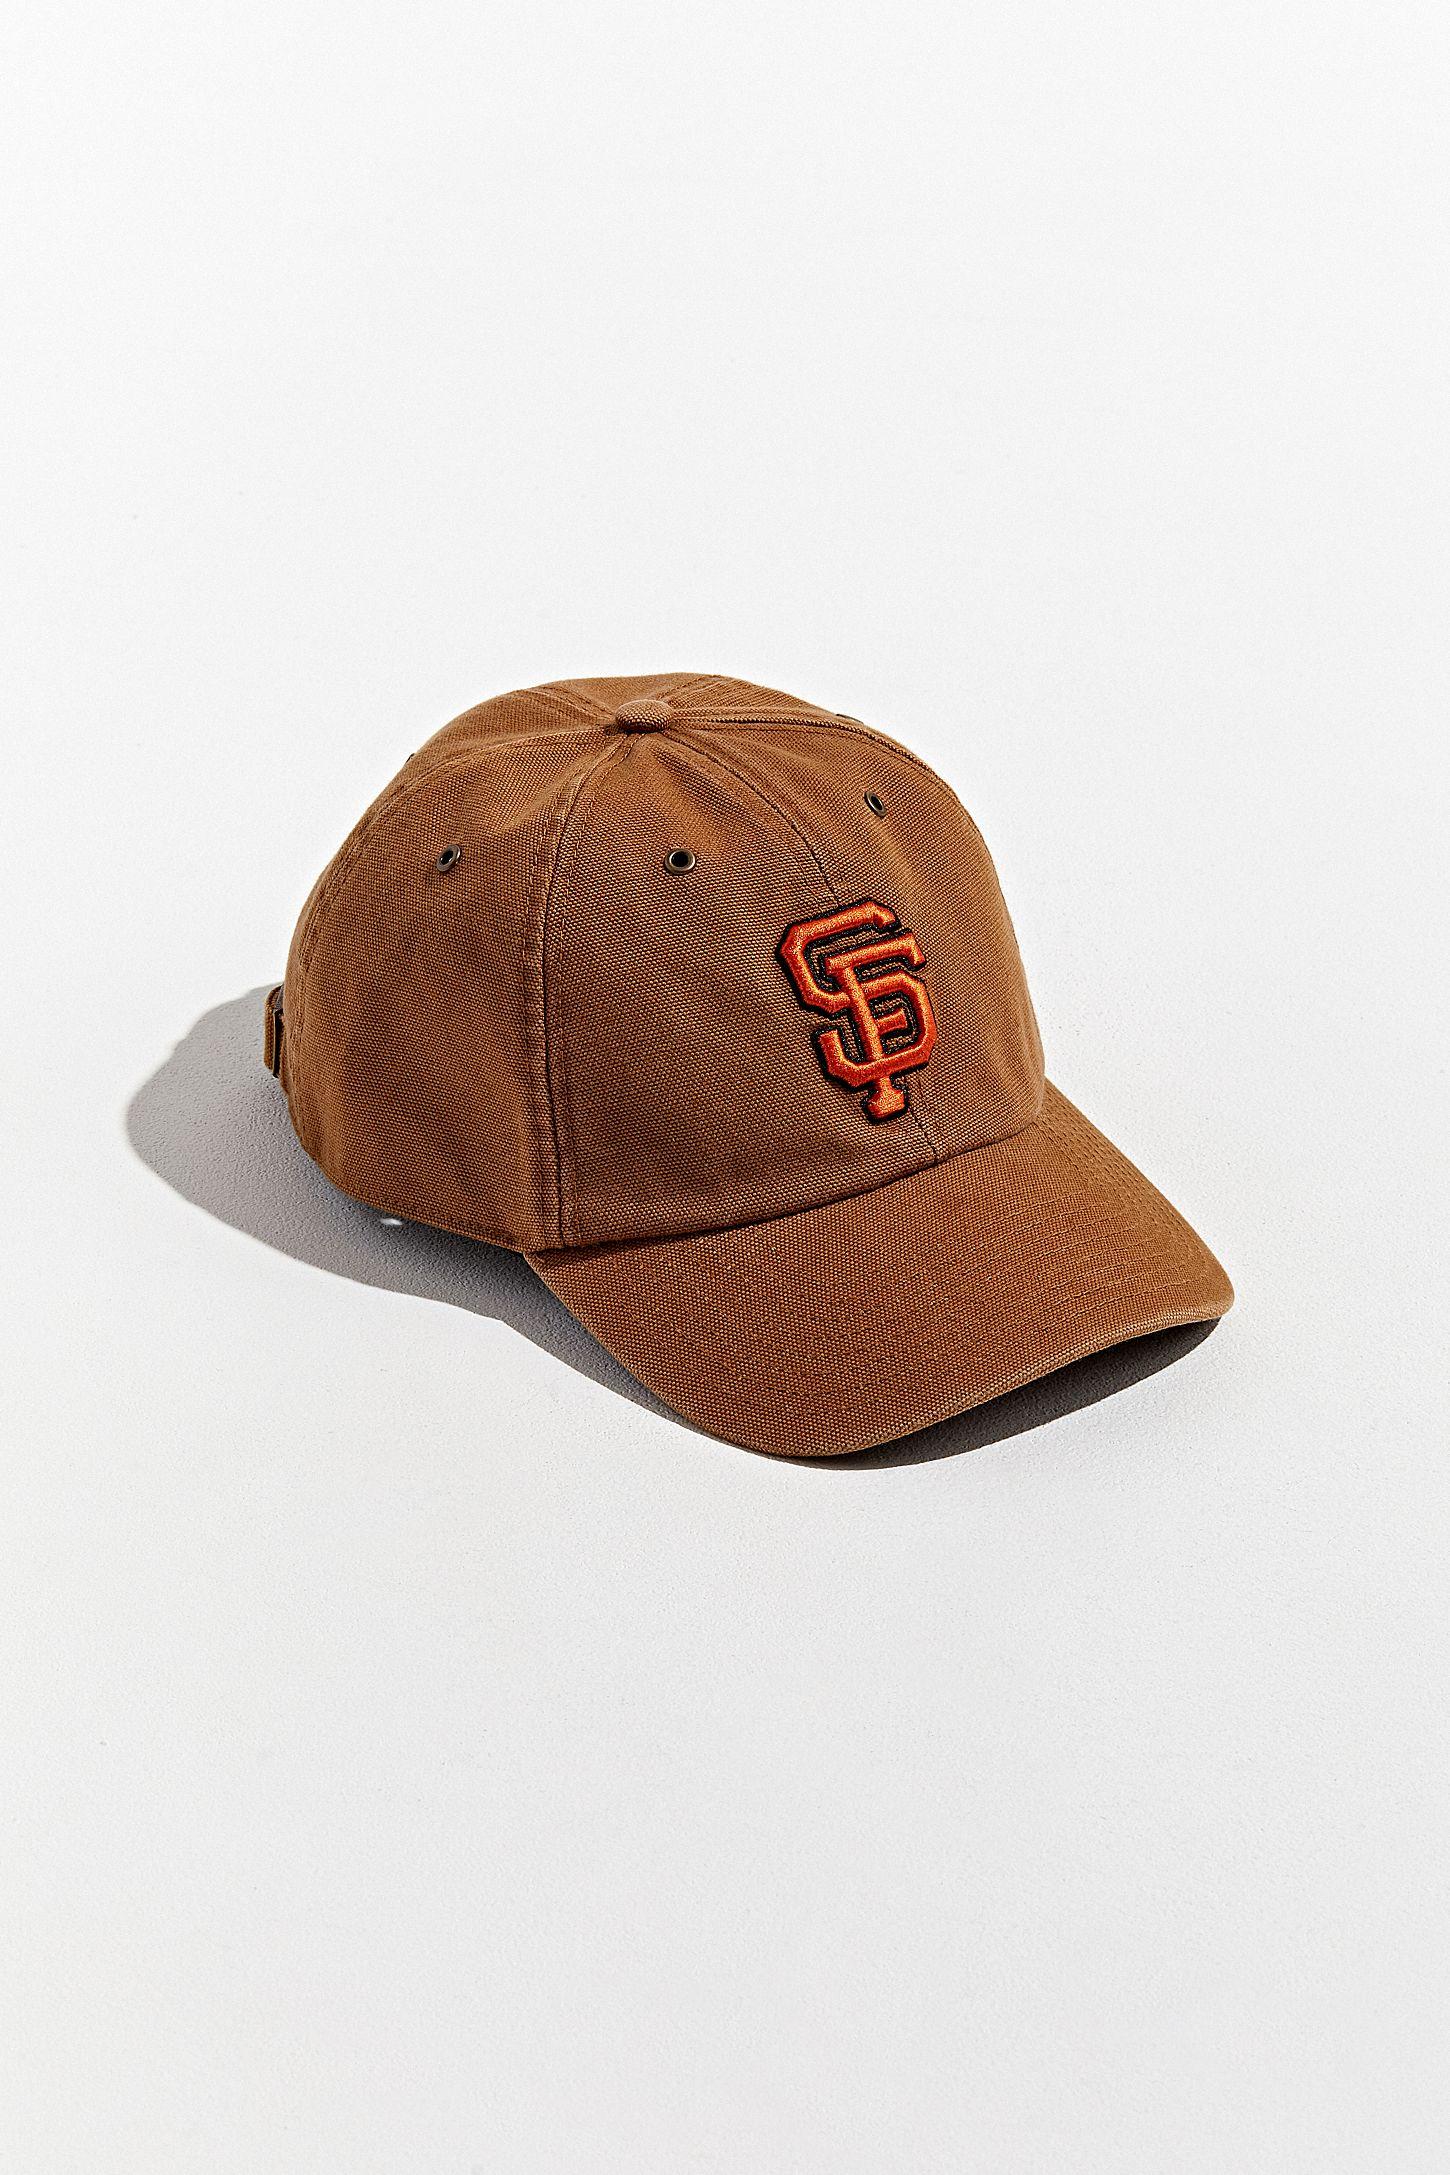 best service ccf30 a098a '47 X Carhartt San Francisco Giants Baseball Hat